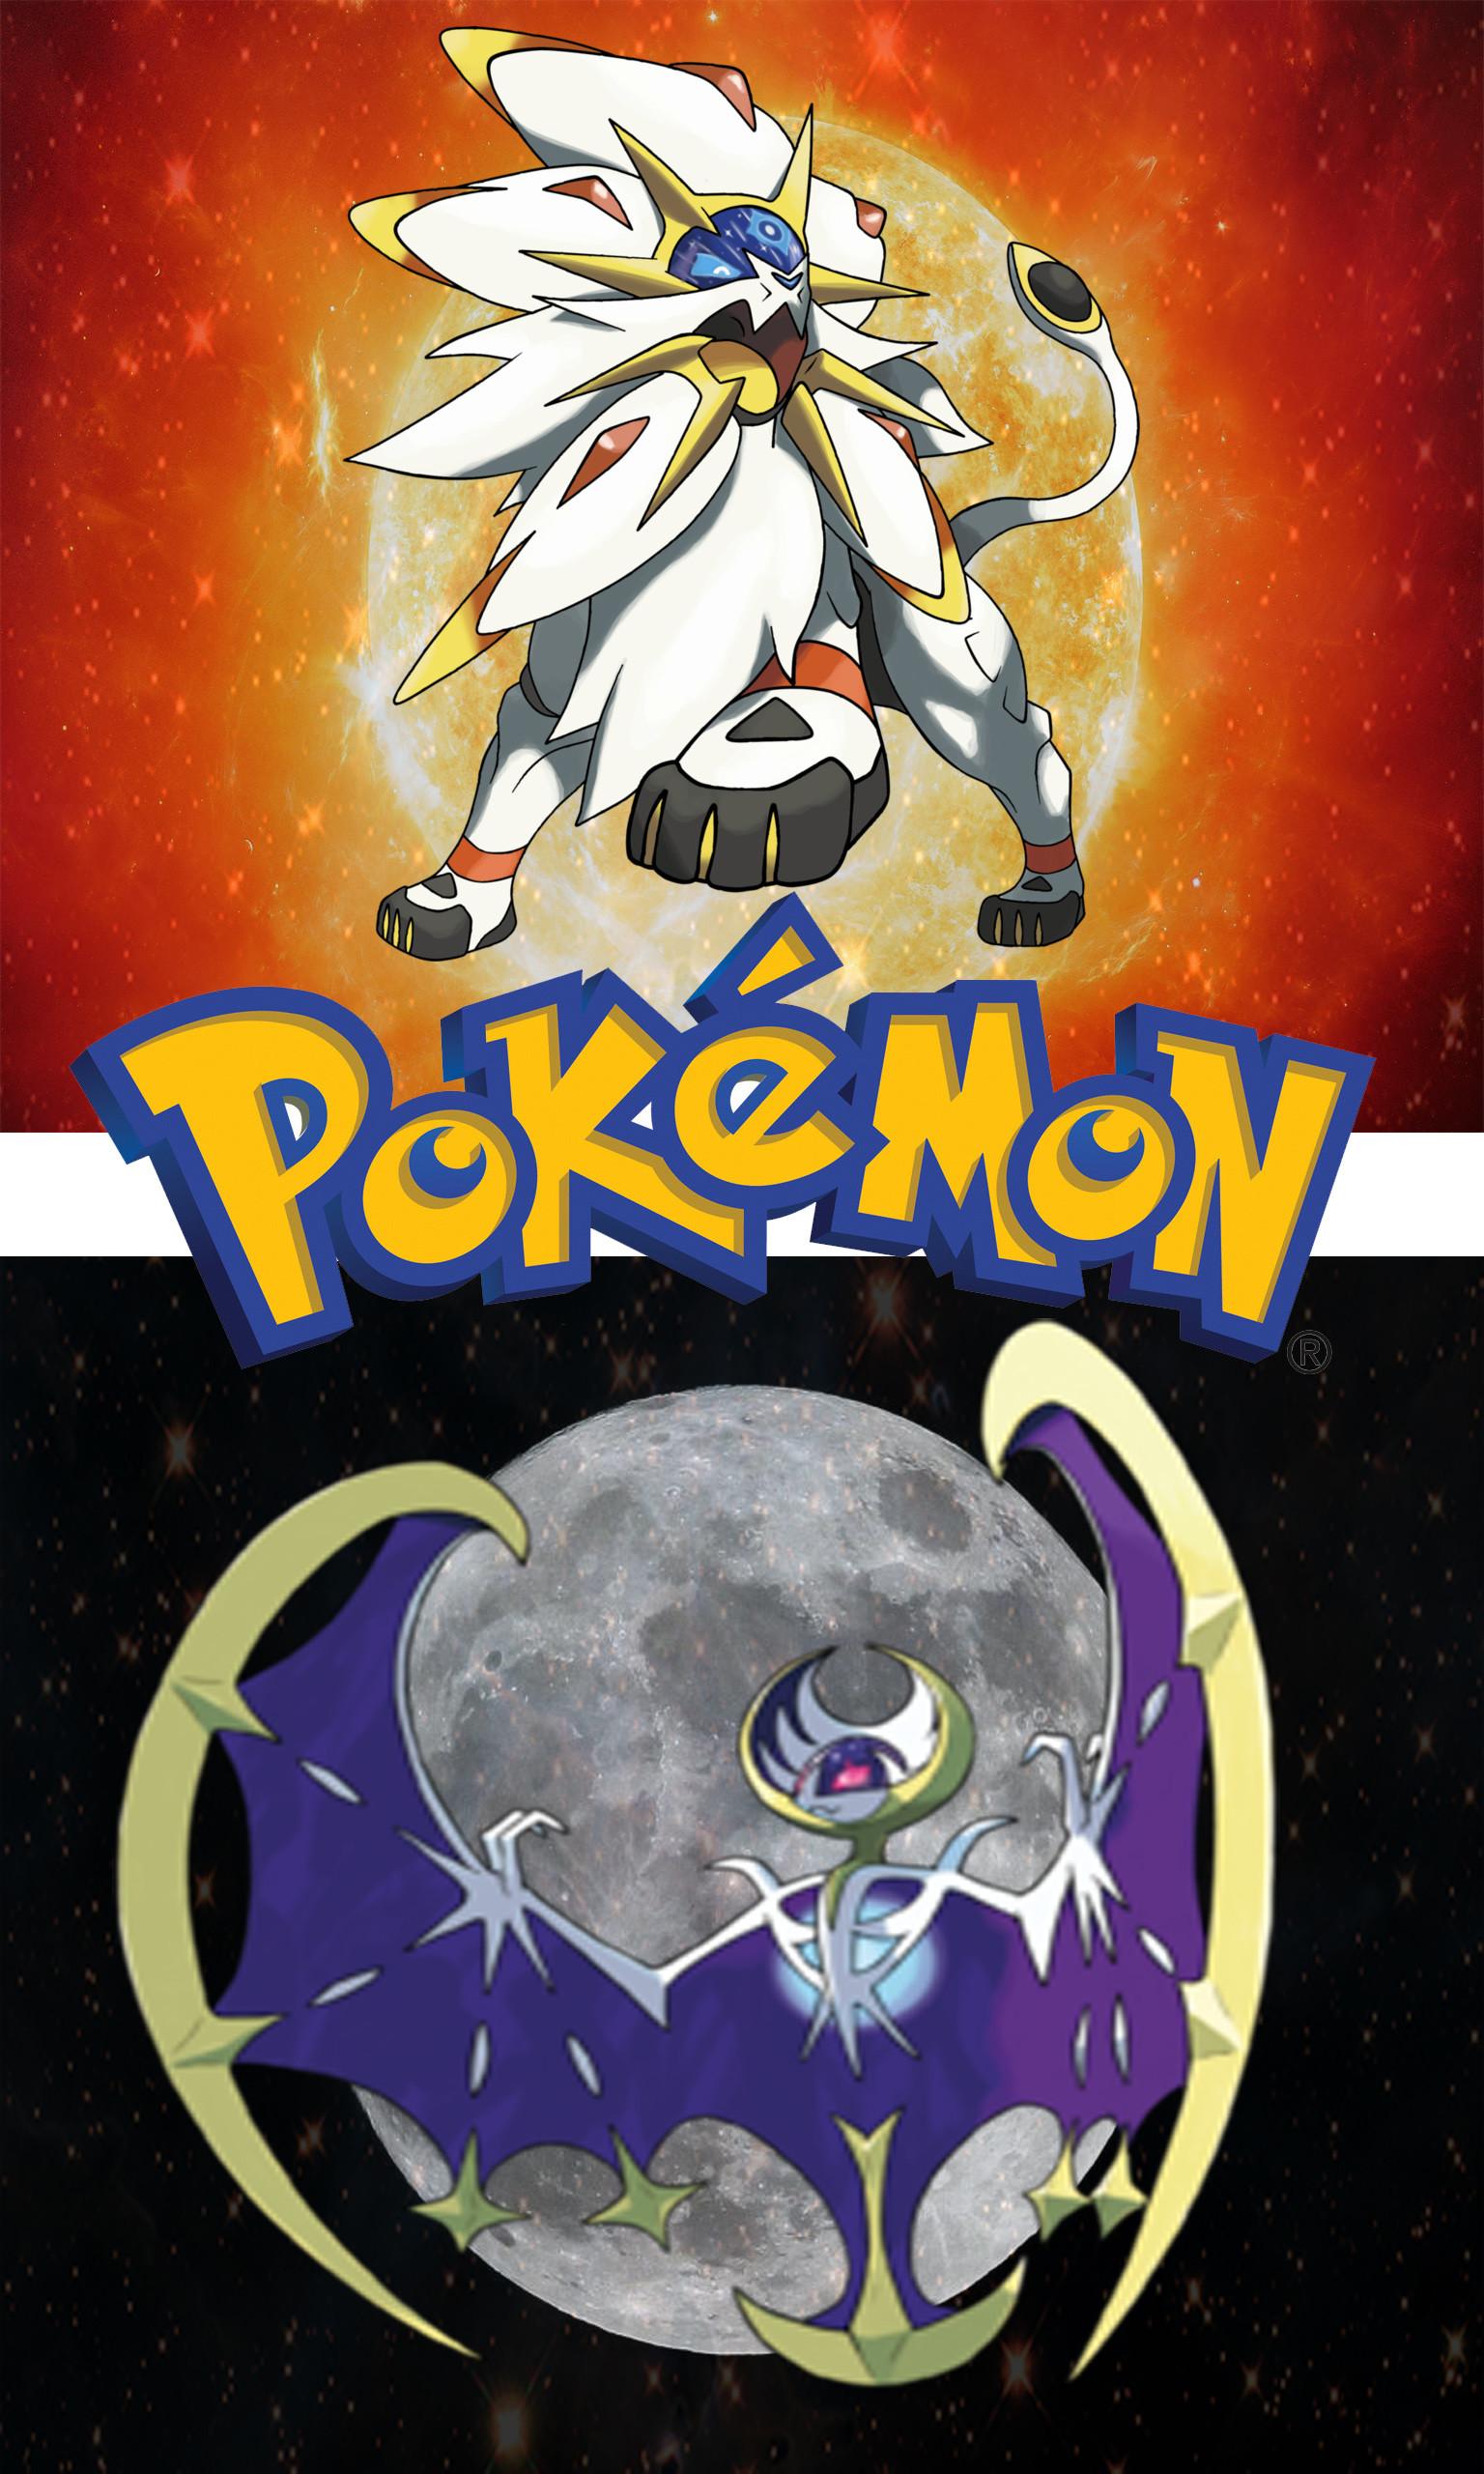 Pokemon Sun And Moon Wallpaper By Zapdosongo - Pokemon , HD Wallpaper & Backgrounds